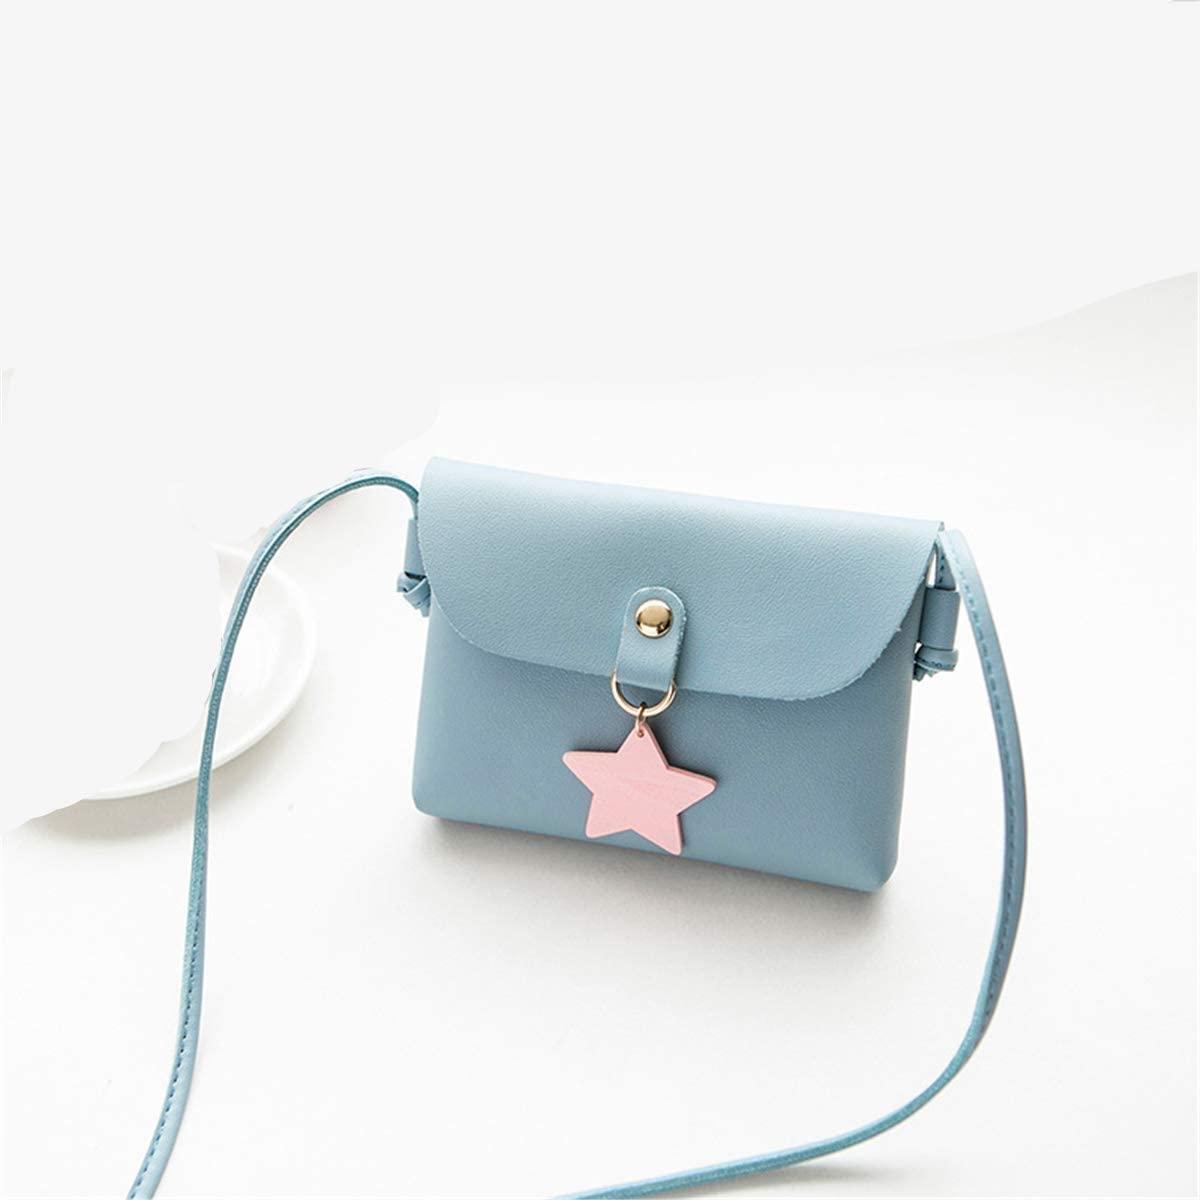 minansostey Newest Style Fashion Kid Girl PU Leather Crossbody Small Bag, Body Cross Bag, Shoulder Bag,